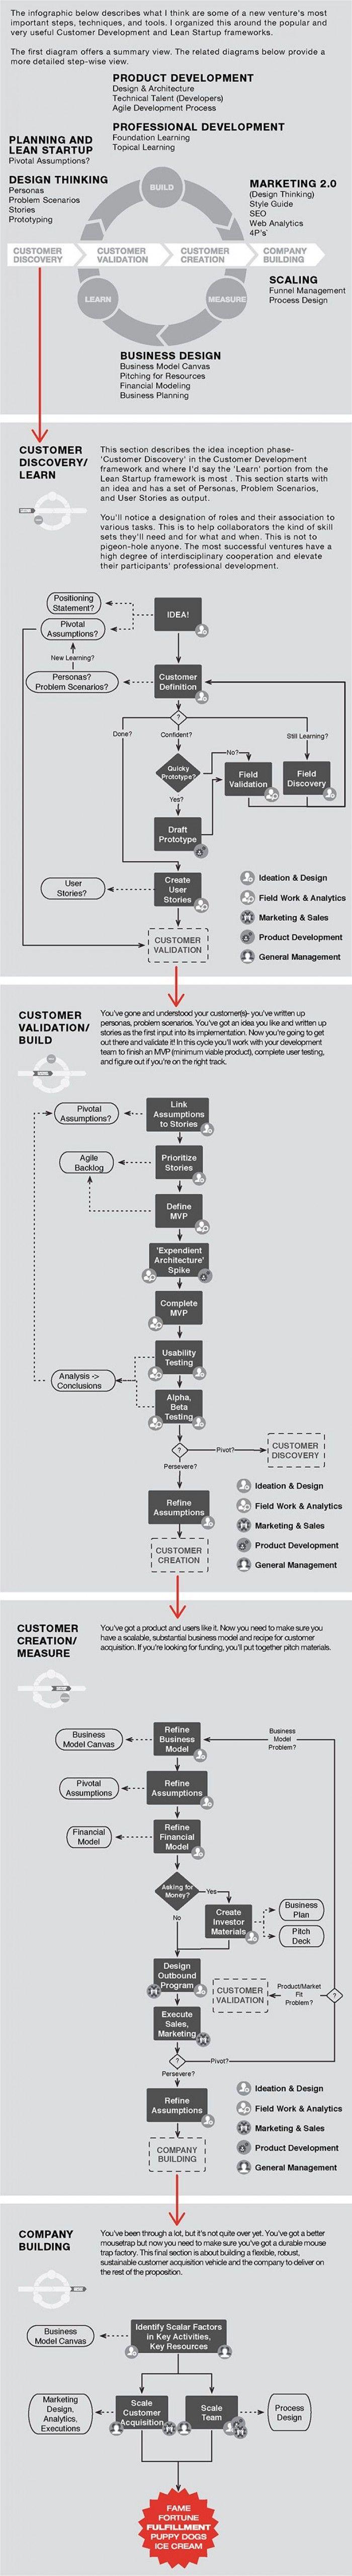 Customer development and Lean Startup process